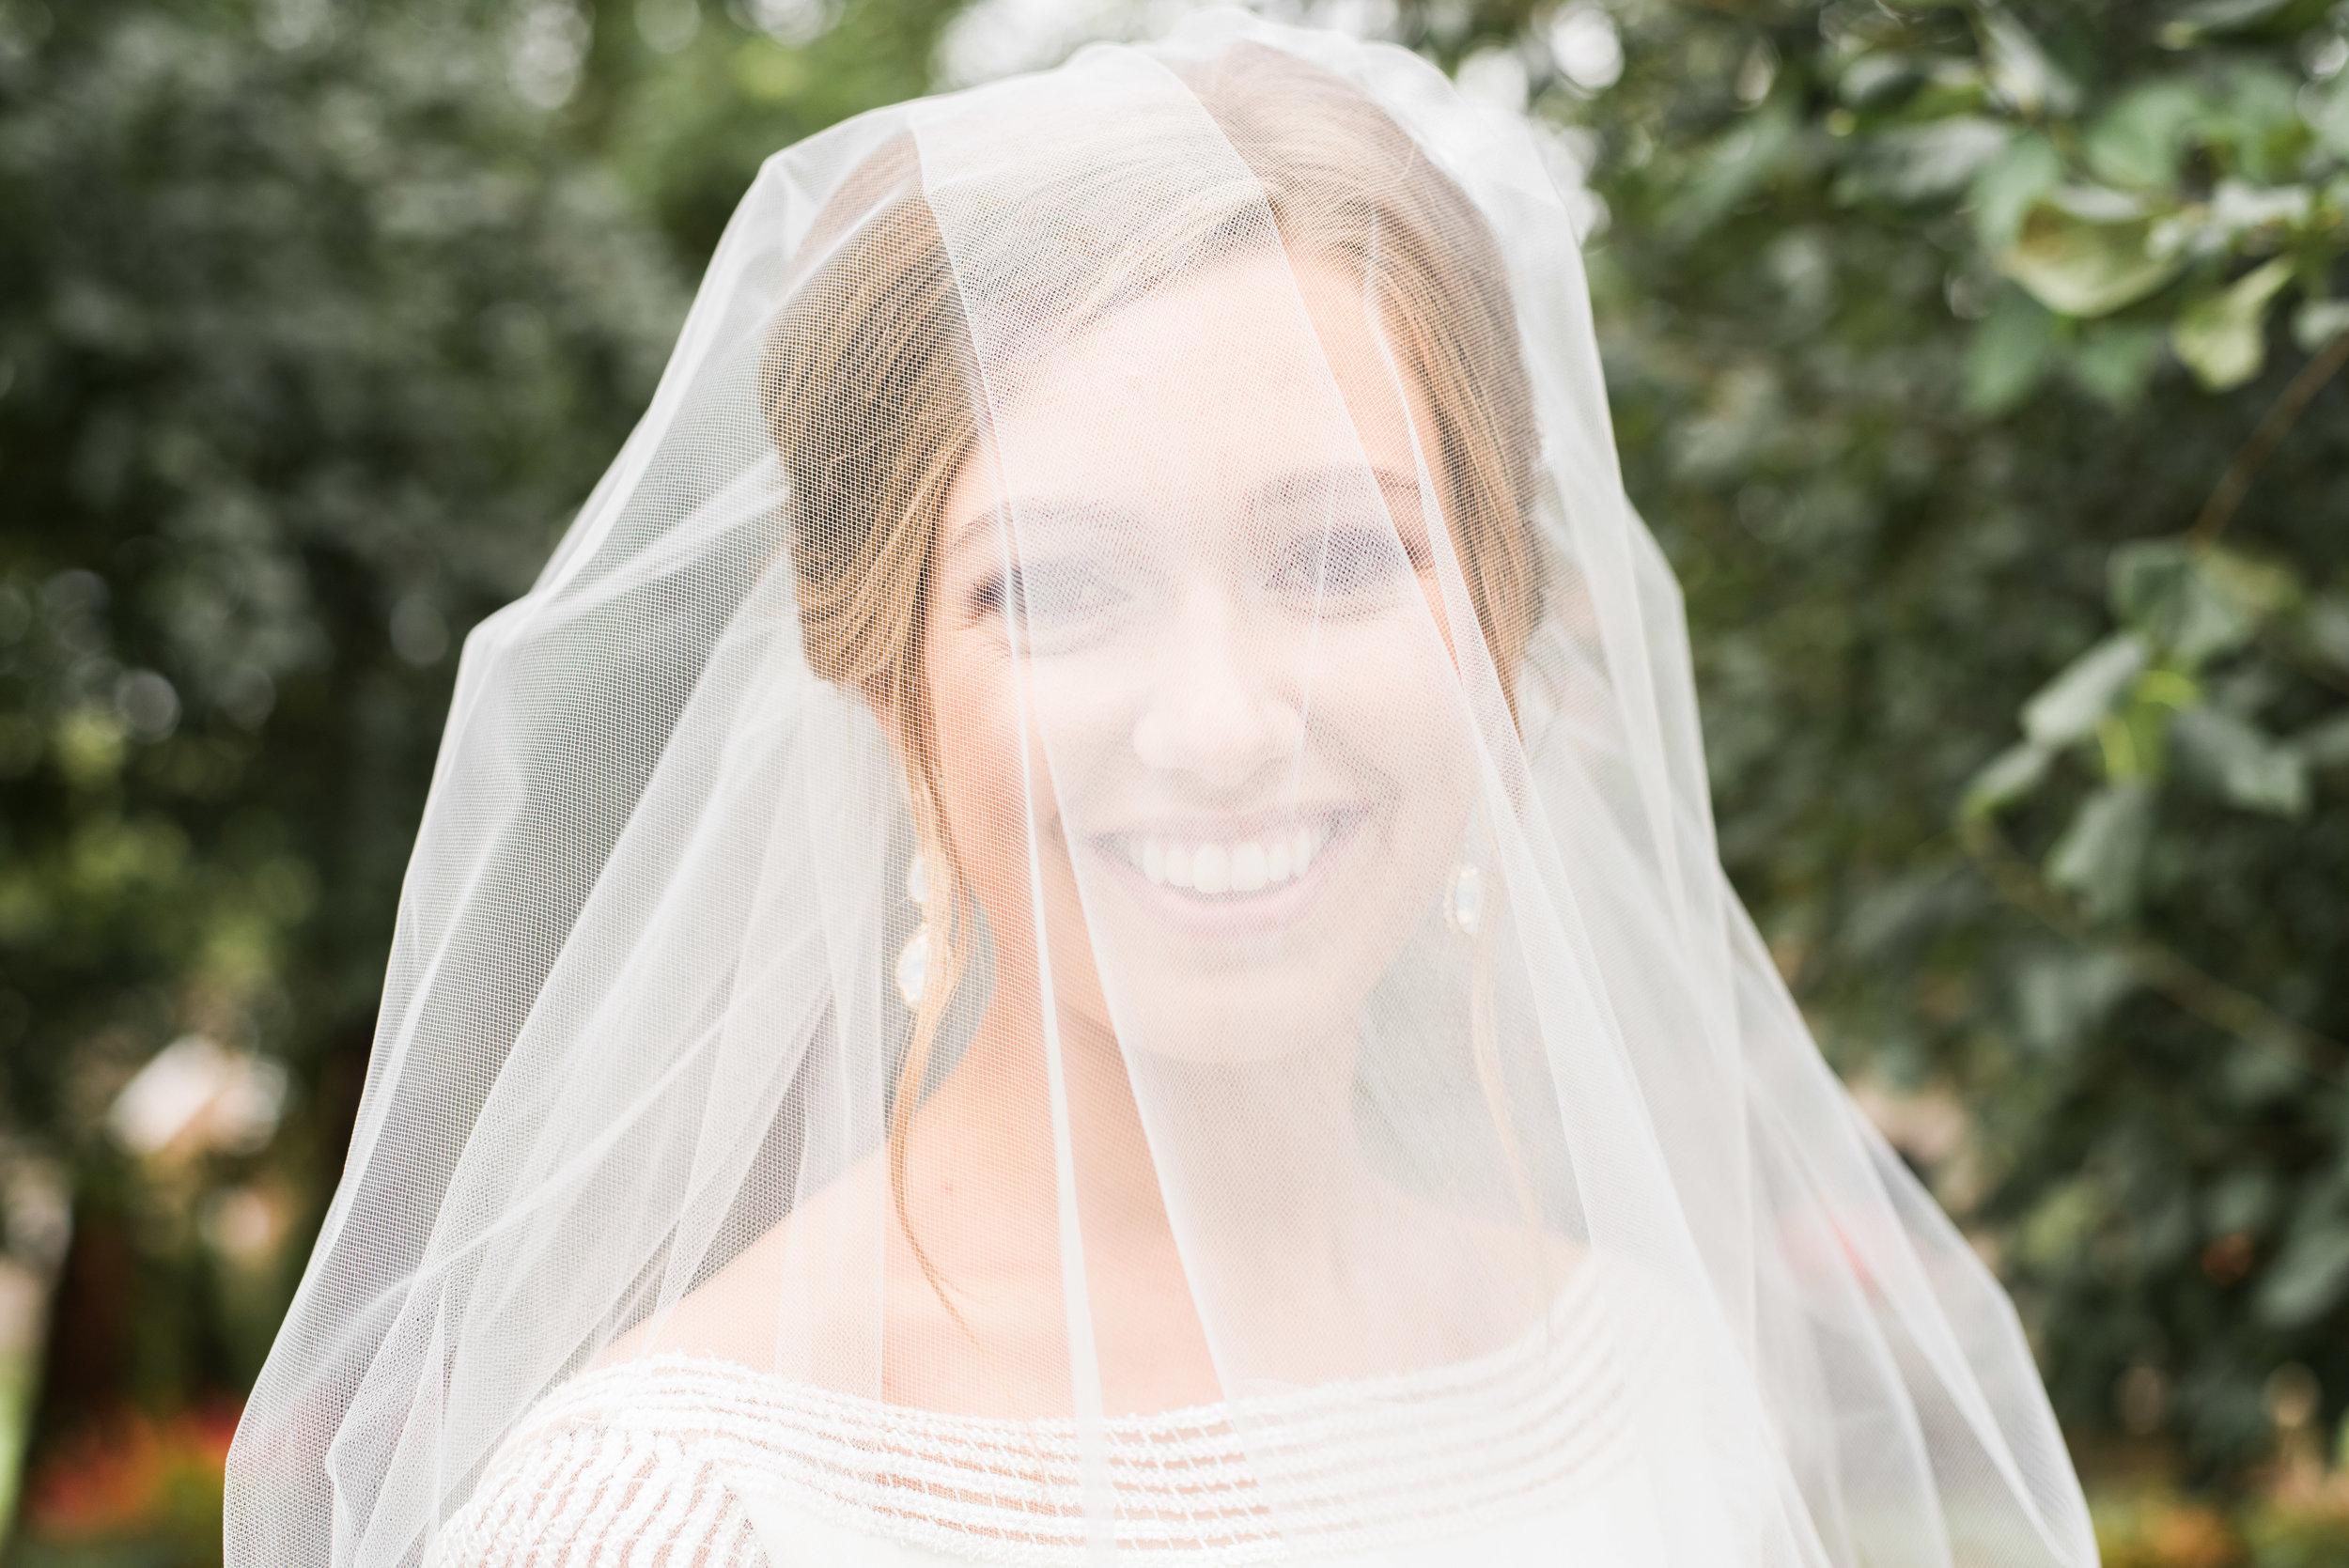 gray-door-photography-wedding-photographer-steph-erffmeyer-dallas-destination-bridal7.jpg